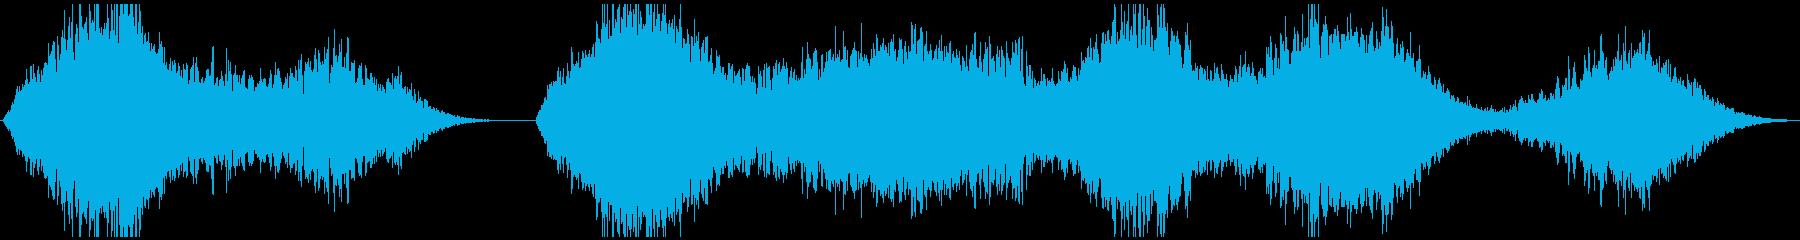 PADS 合唱団パッド01の再生済みの波形